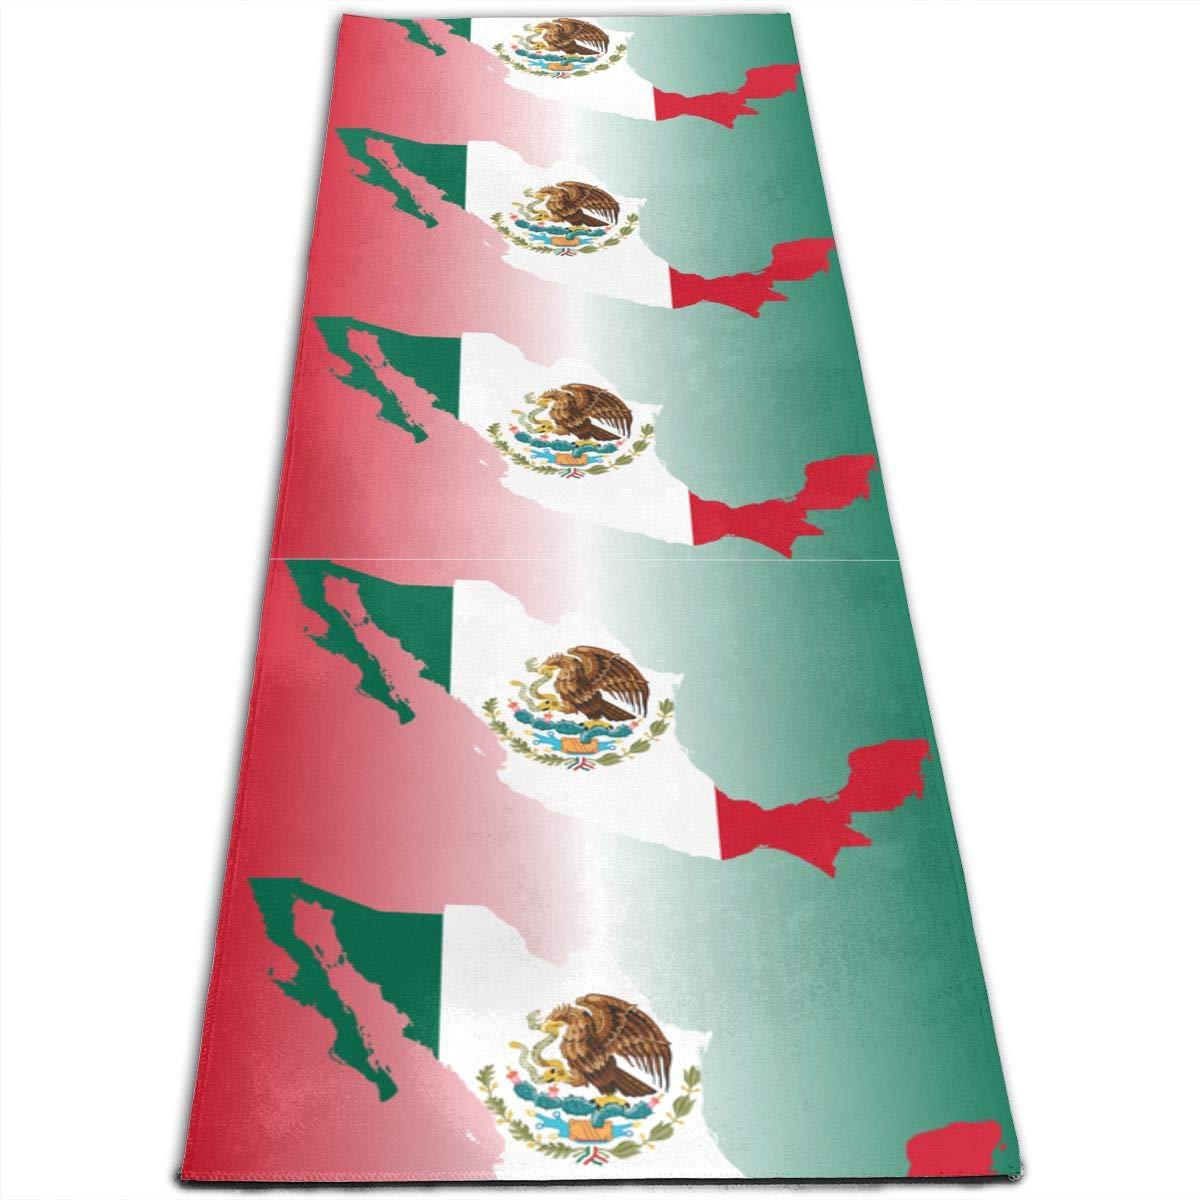 Amazon.com: Mexico Flag Map Pattern Printed Yoga Mat Prana ...